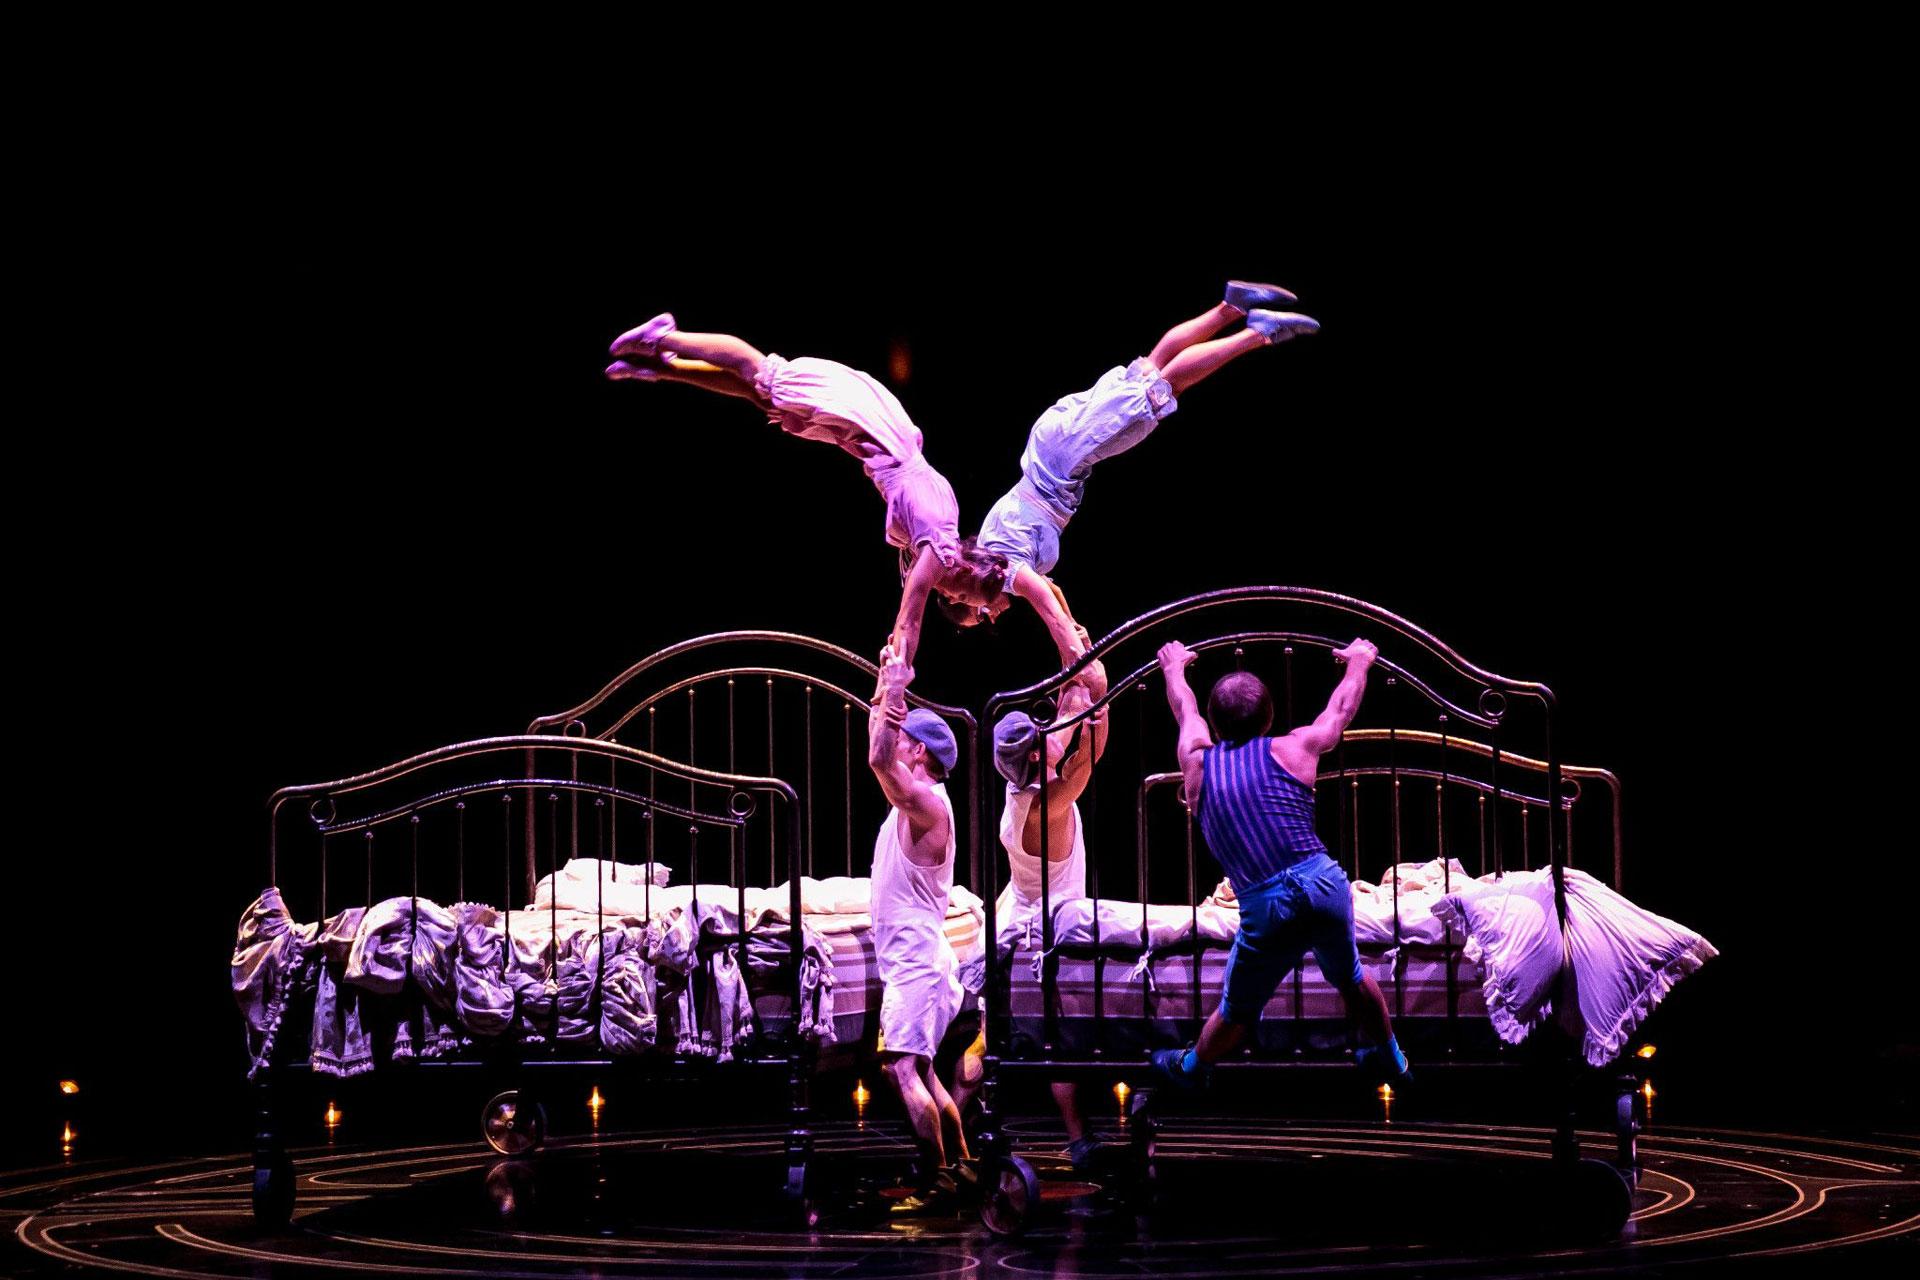 Linkki tapahtumaan Cirque du Soleil: Corteo